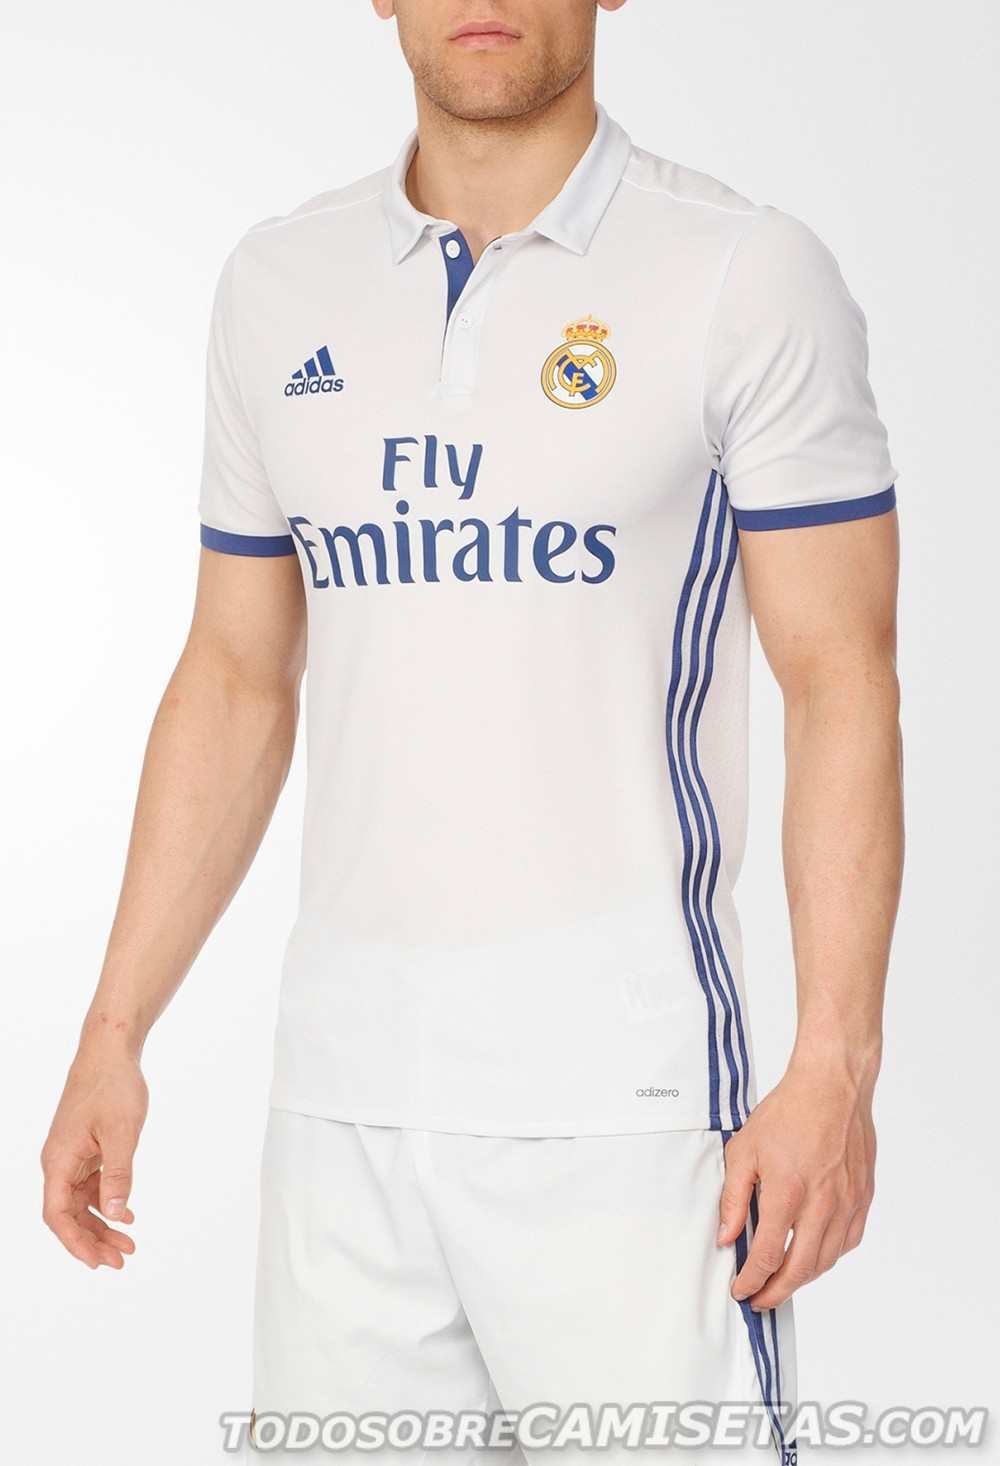 Real-Madrid-2016-17-adidas-new-home-kit-30.jpg